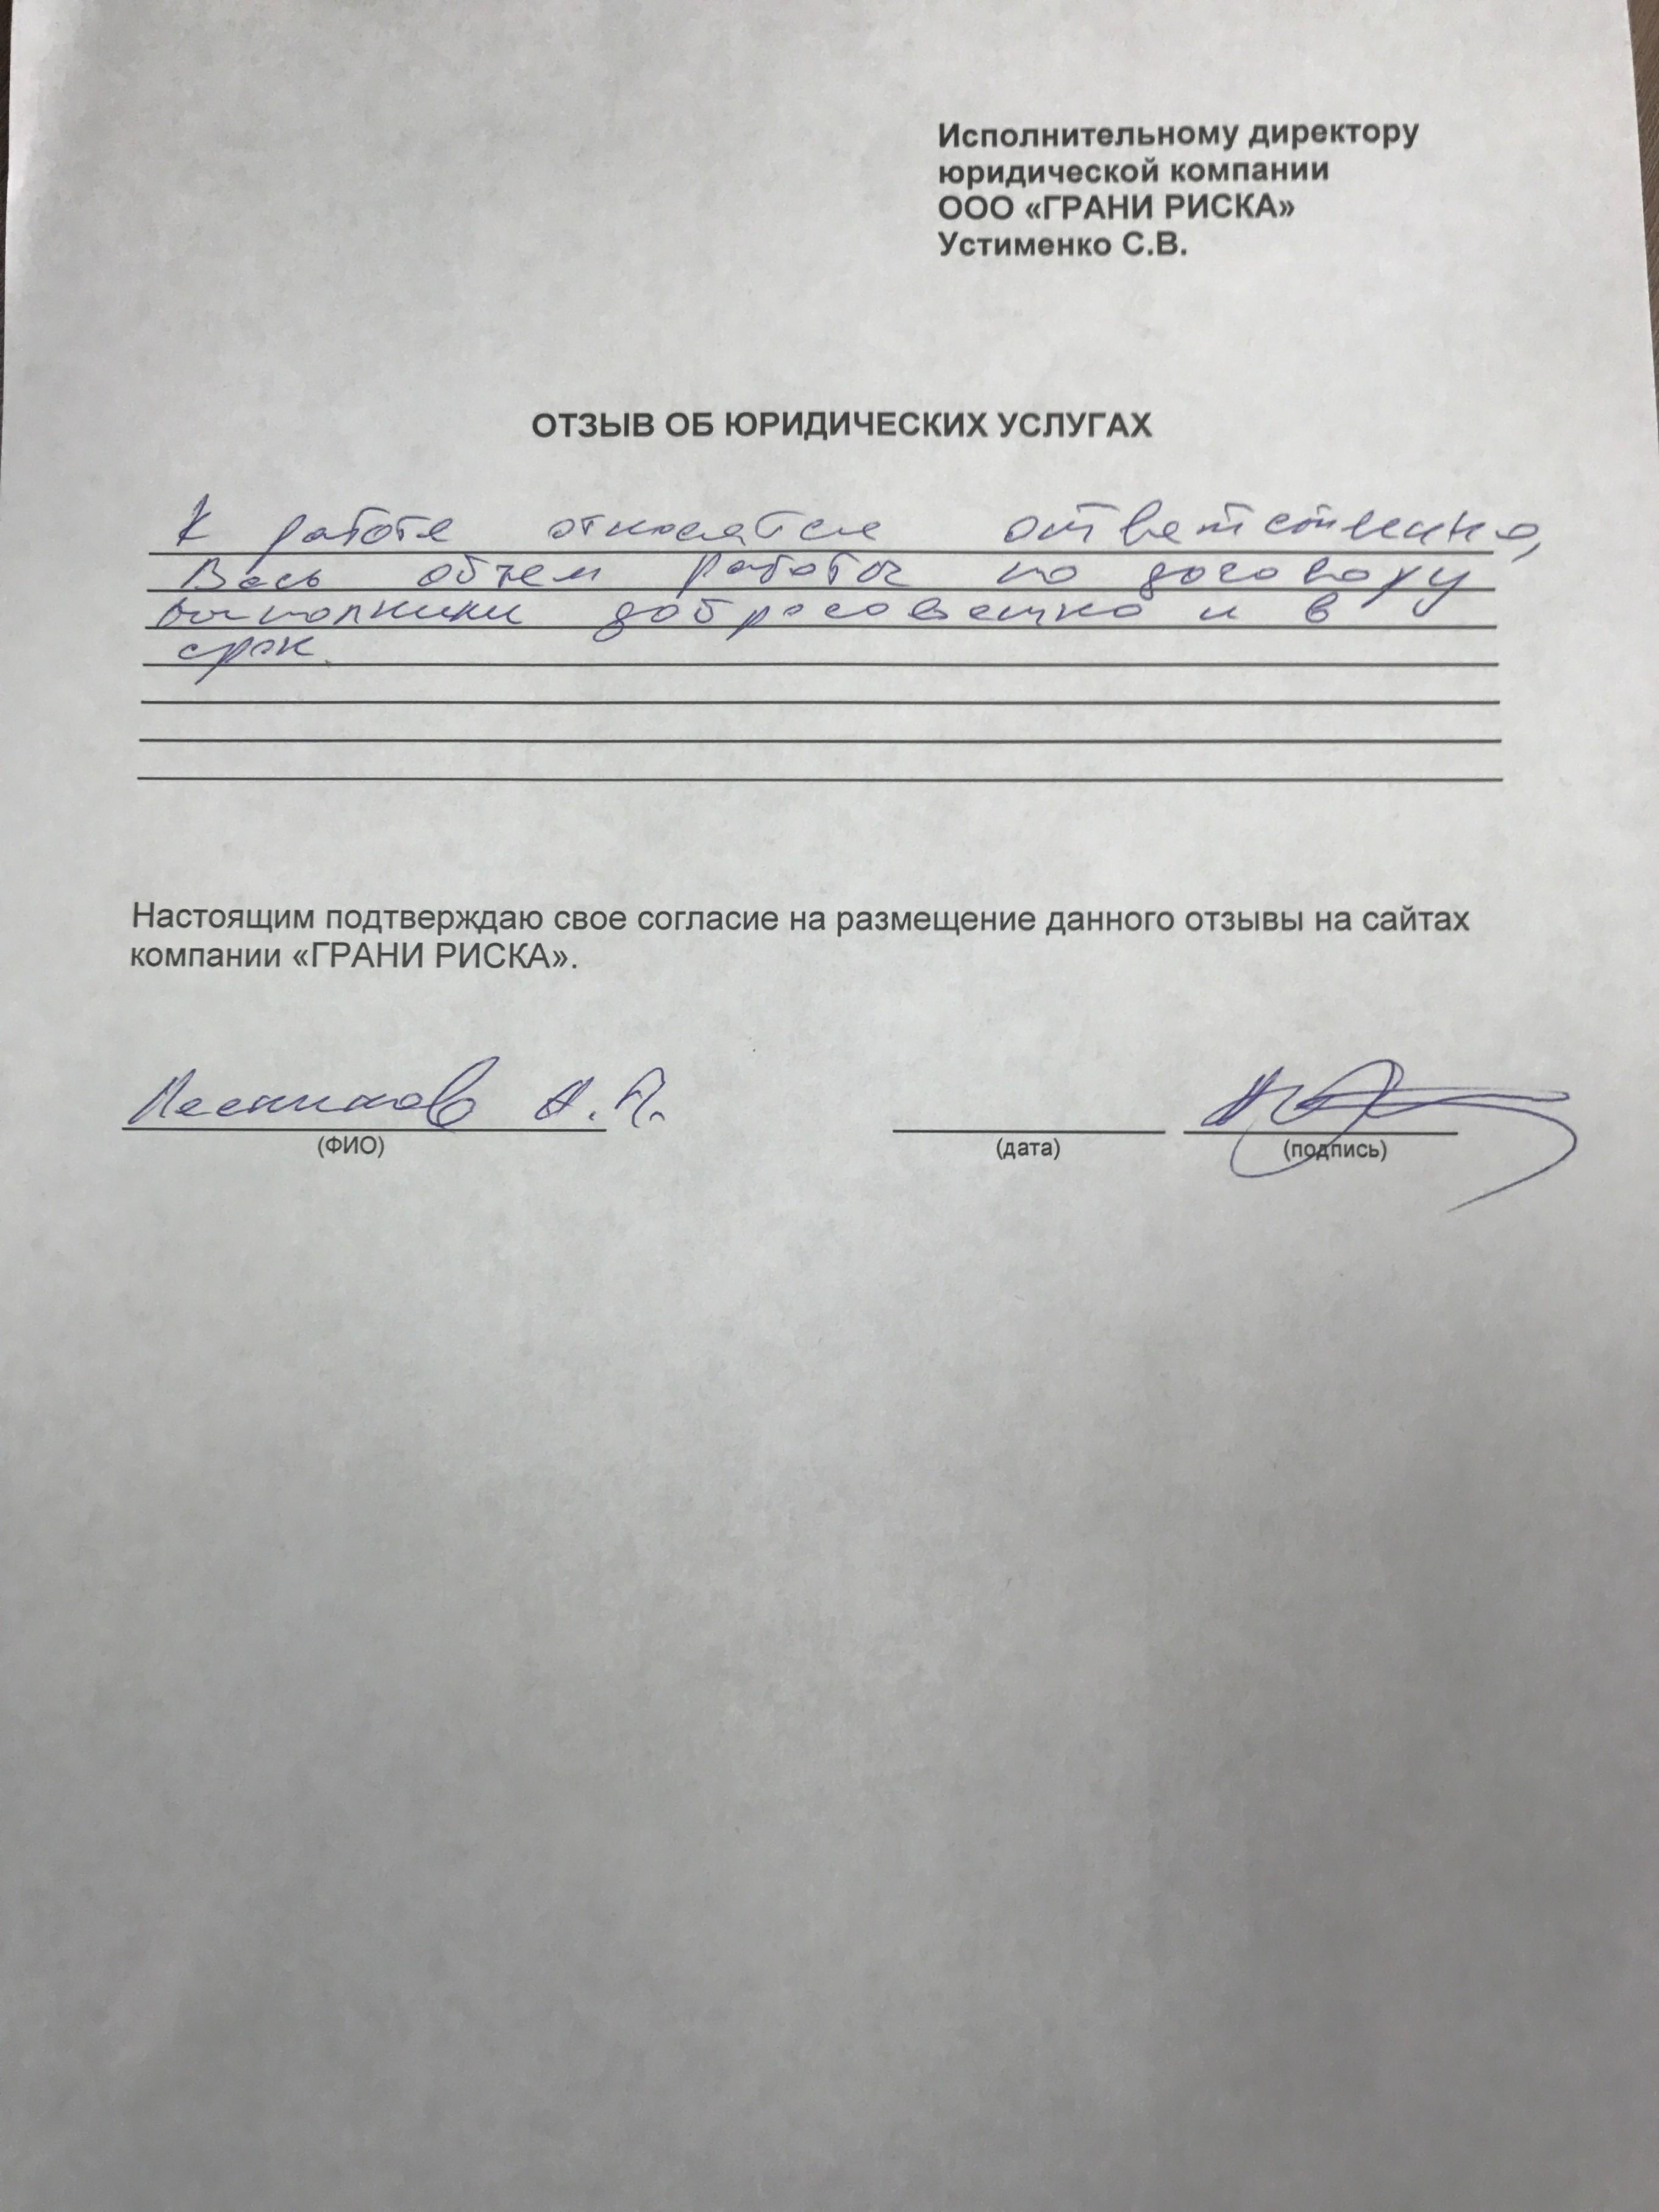 Отзыв Лесникова А. А.